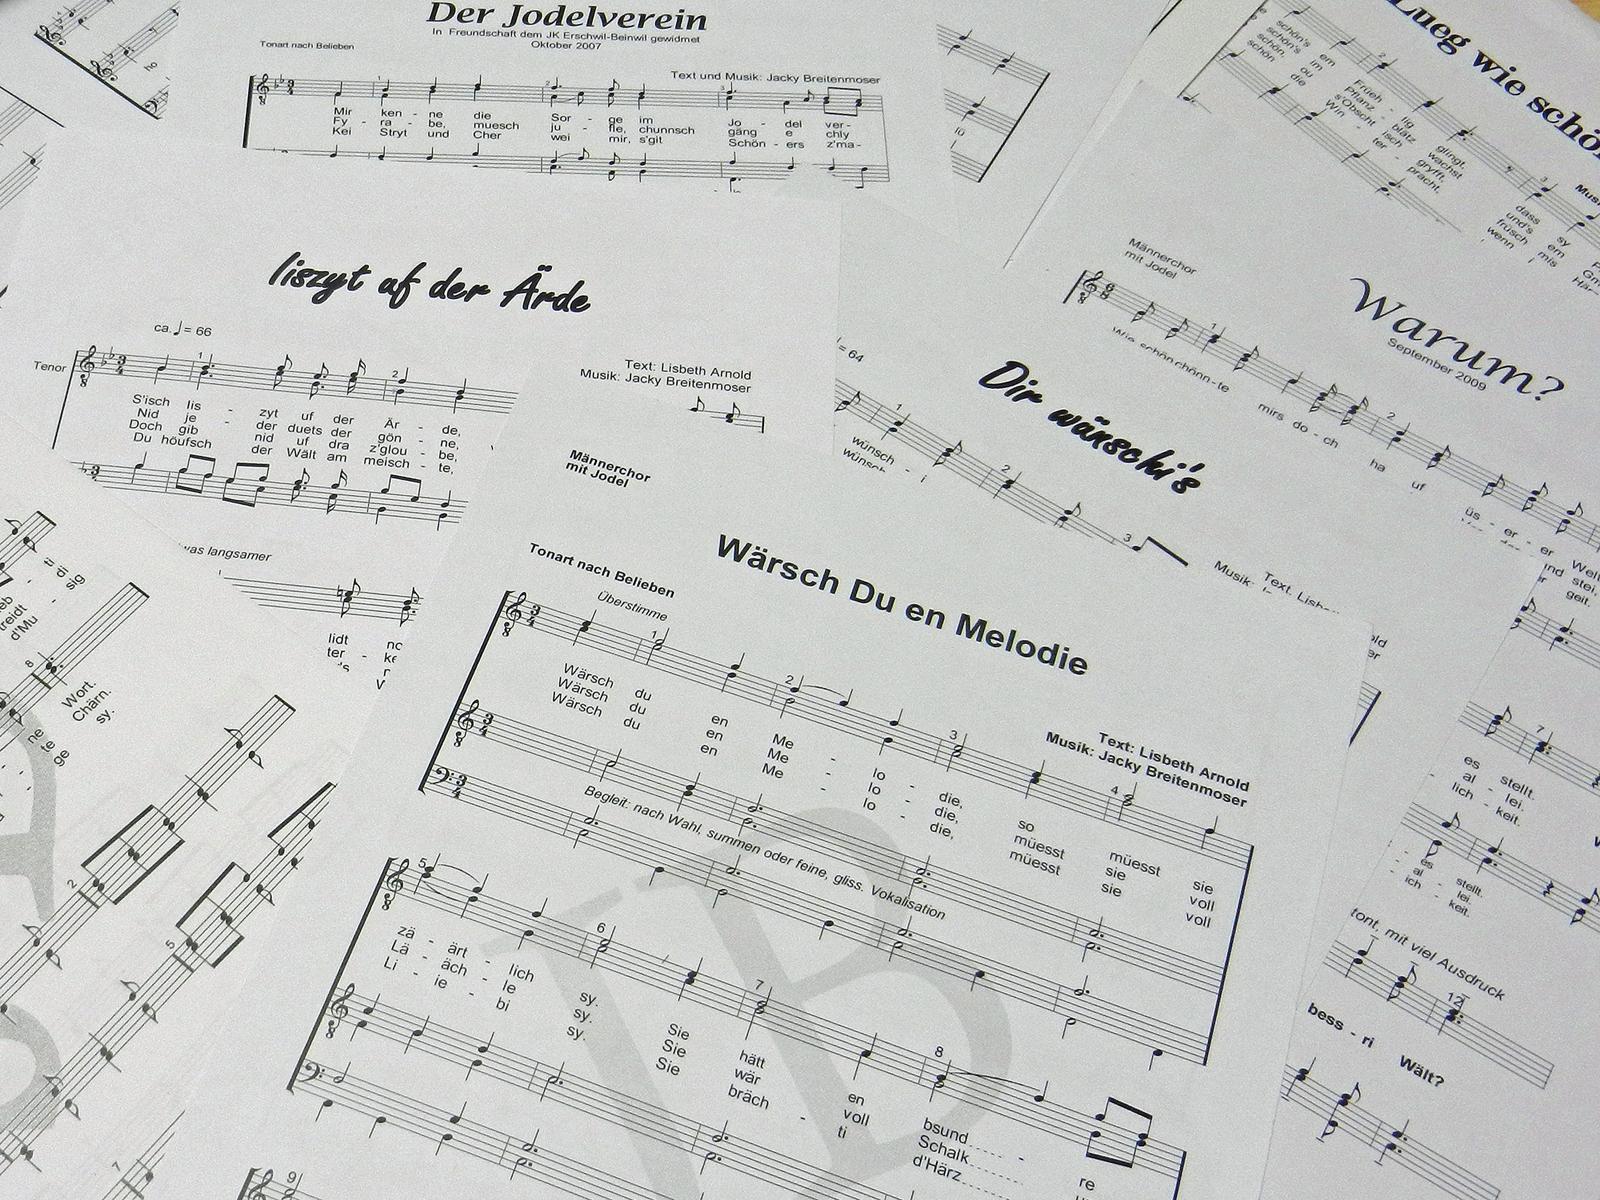 Partituren_Kompositionen